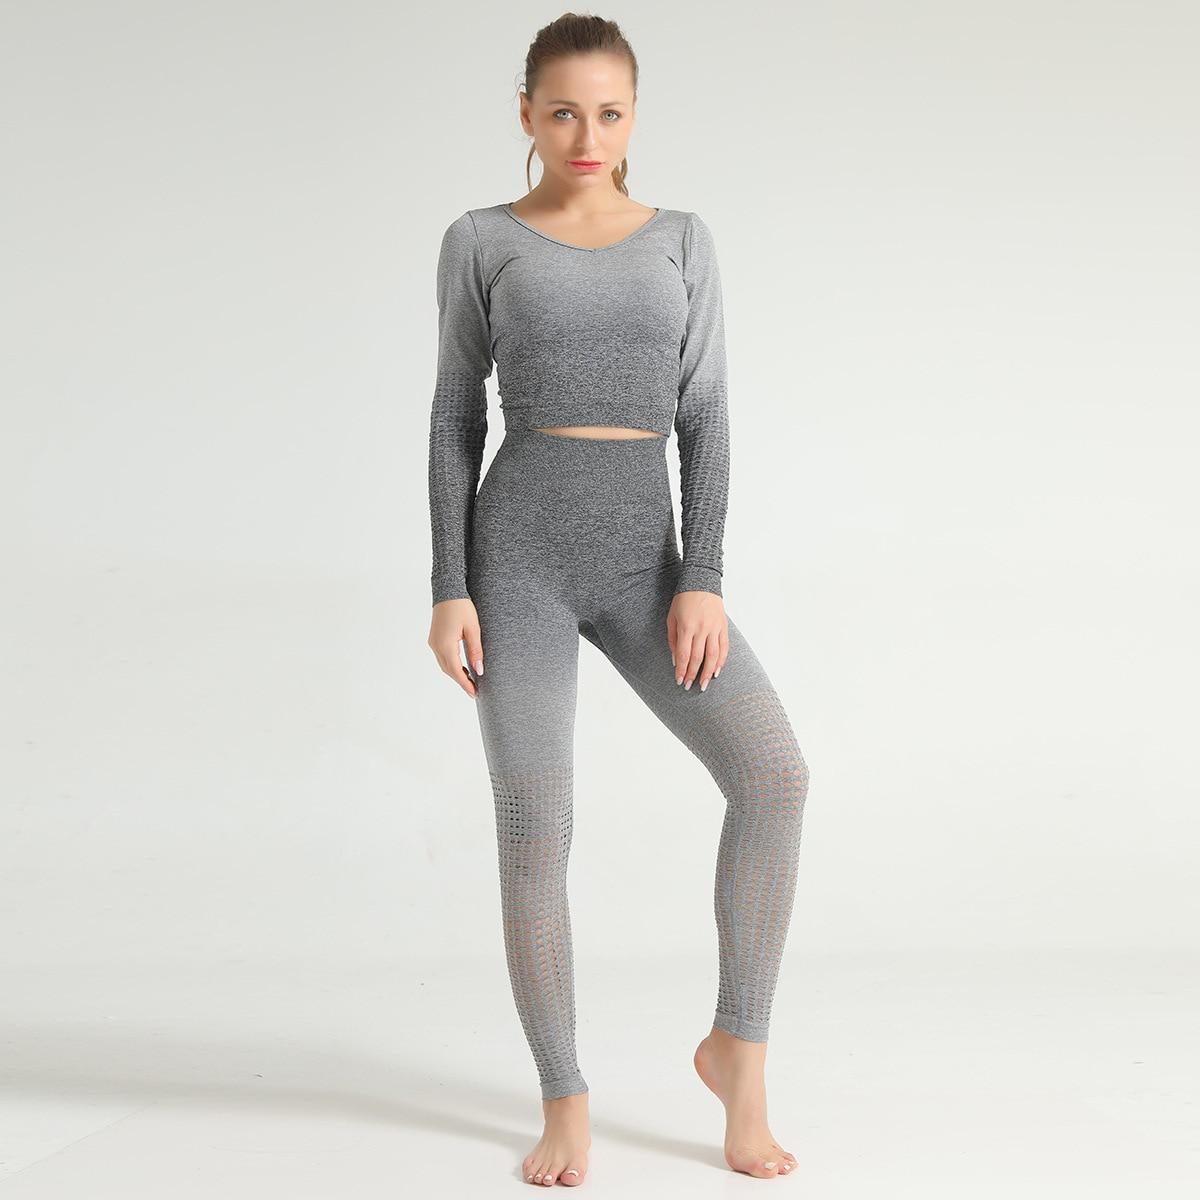 Ombre sem costura conjuntos de yoga feminino